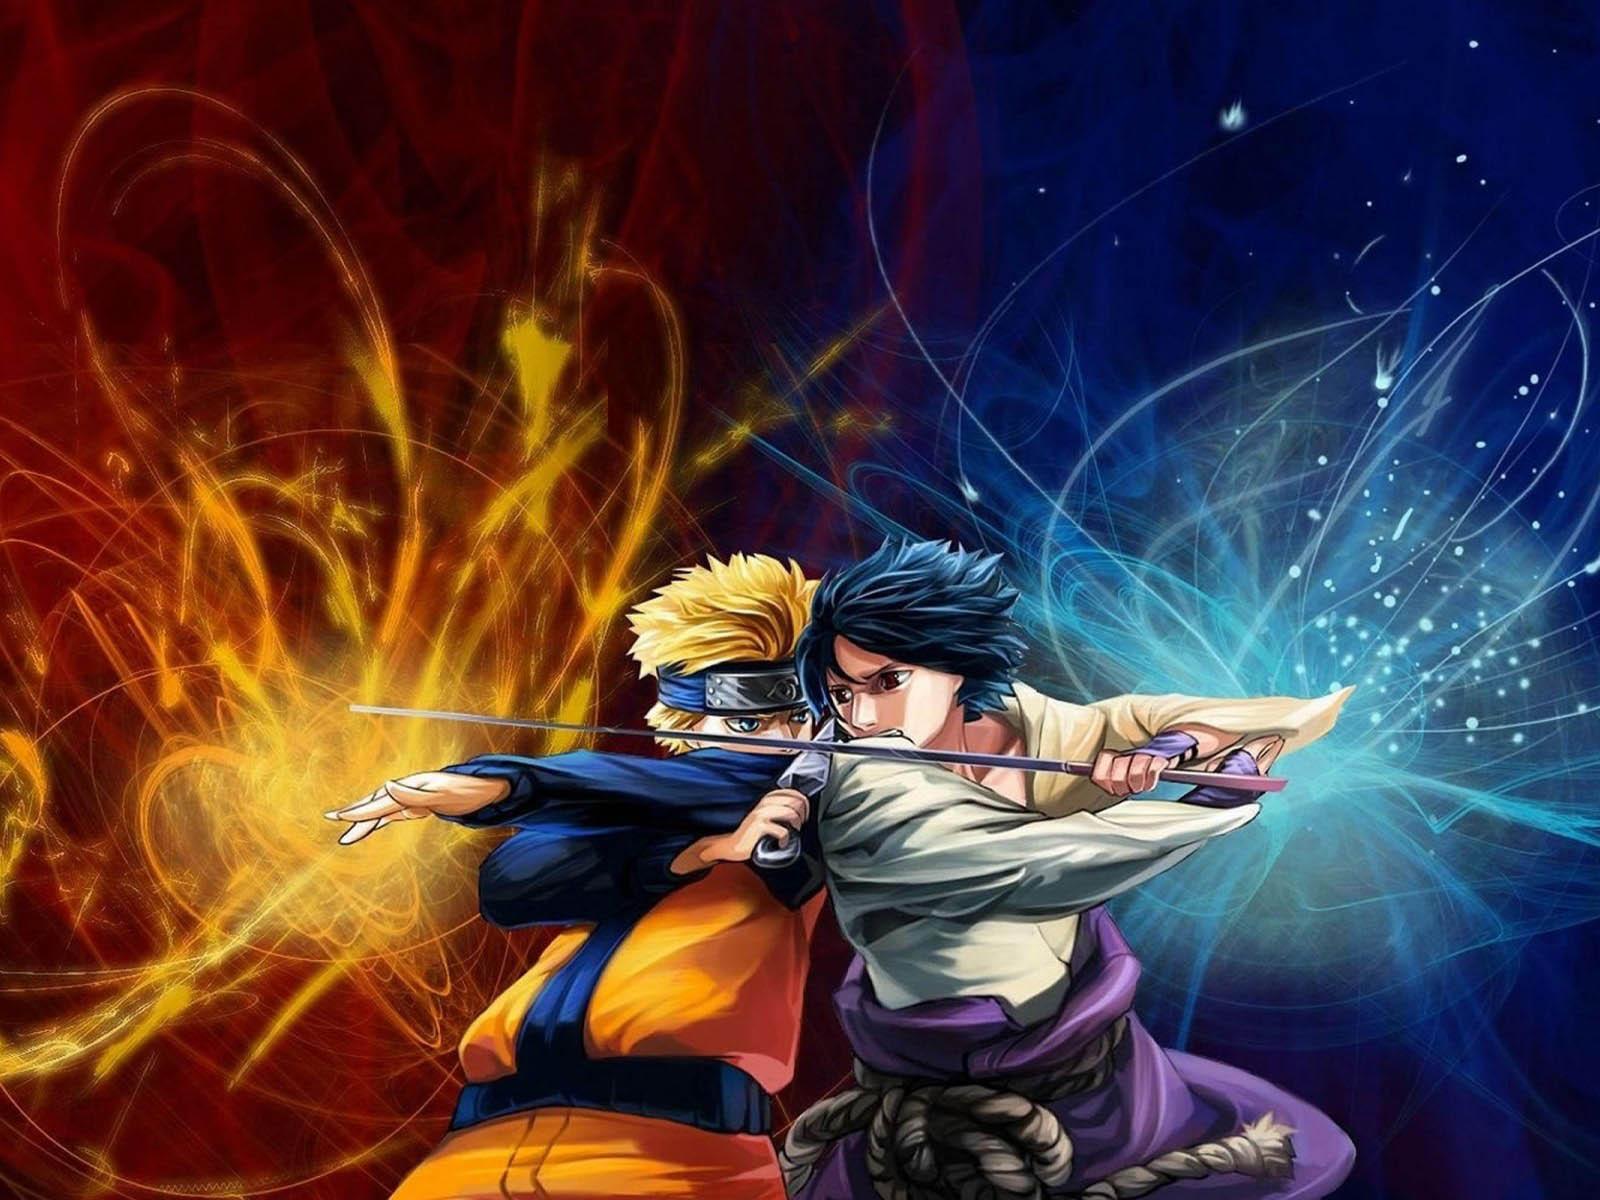 wallpapers Naruto Shippuden Wallpapers 1600x1200